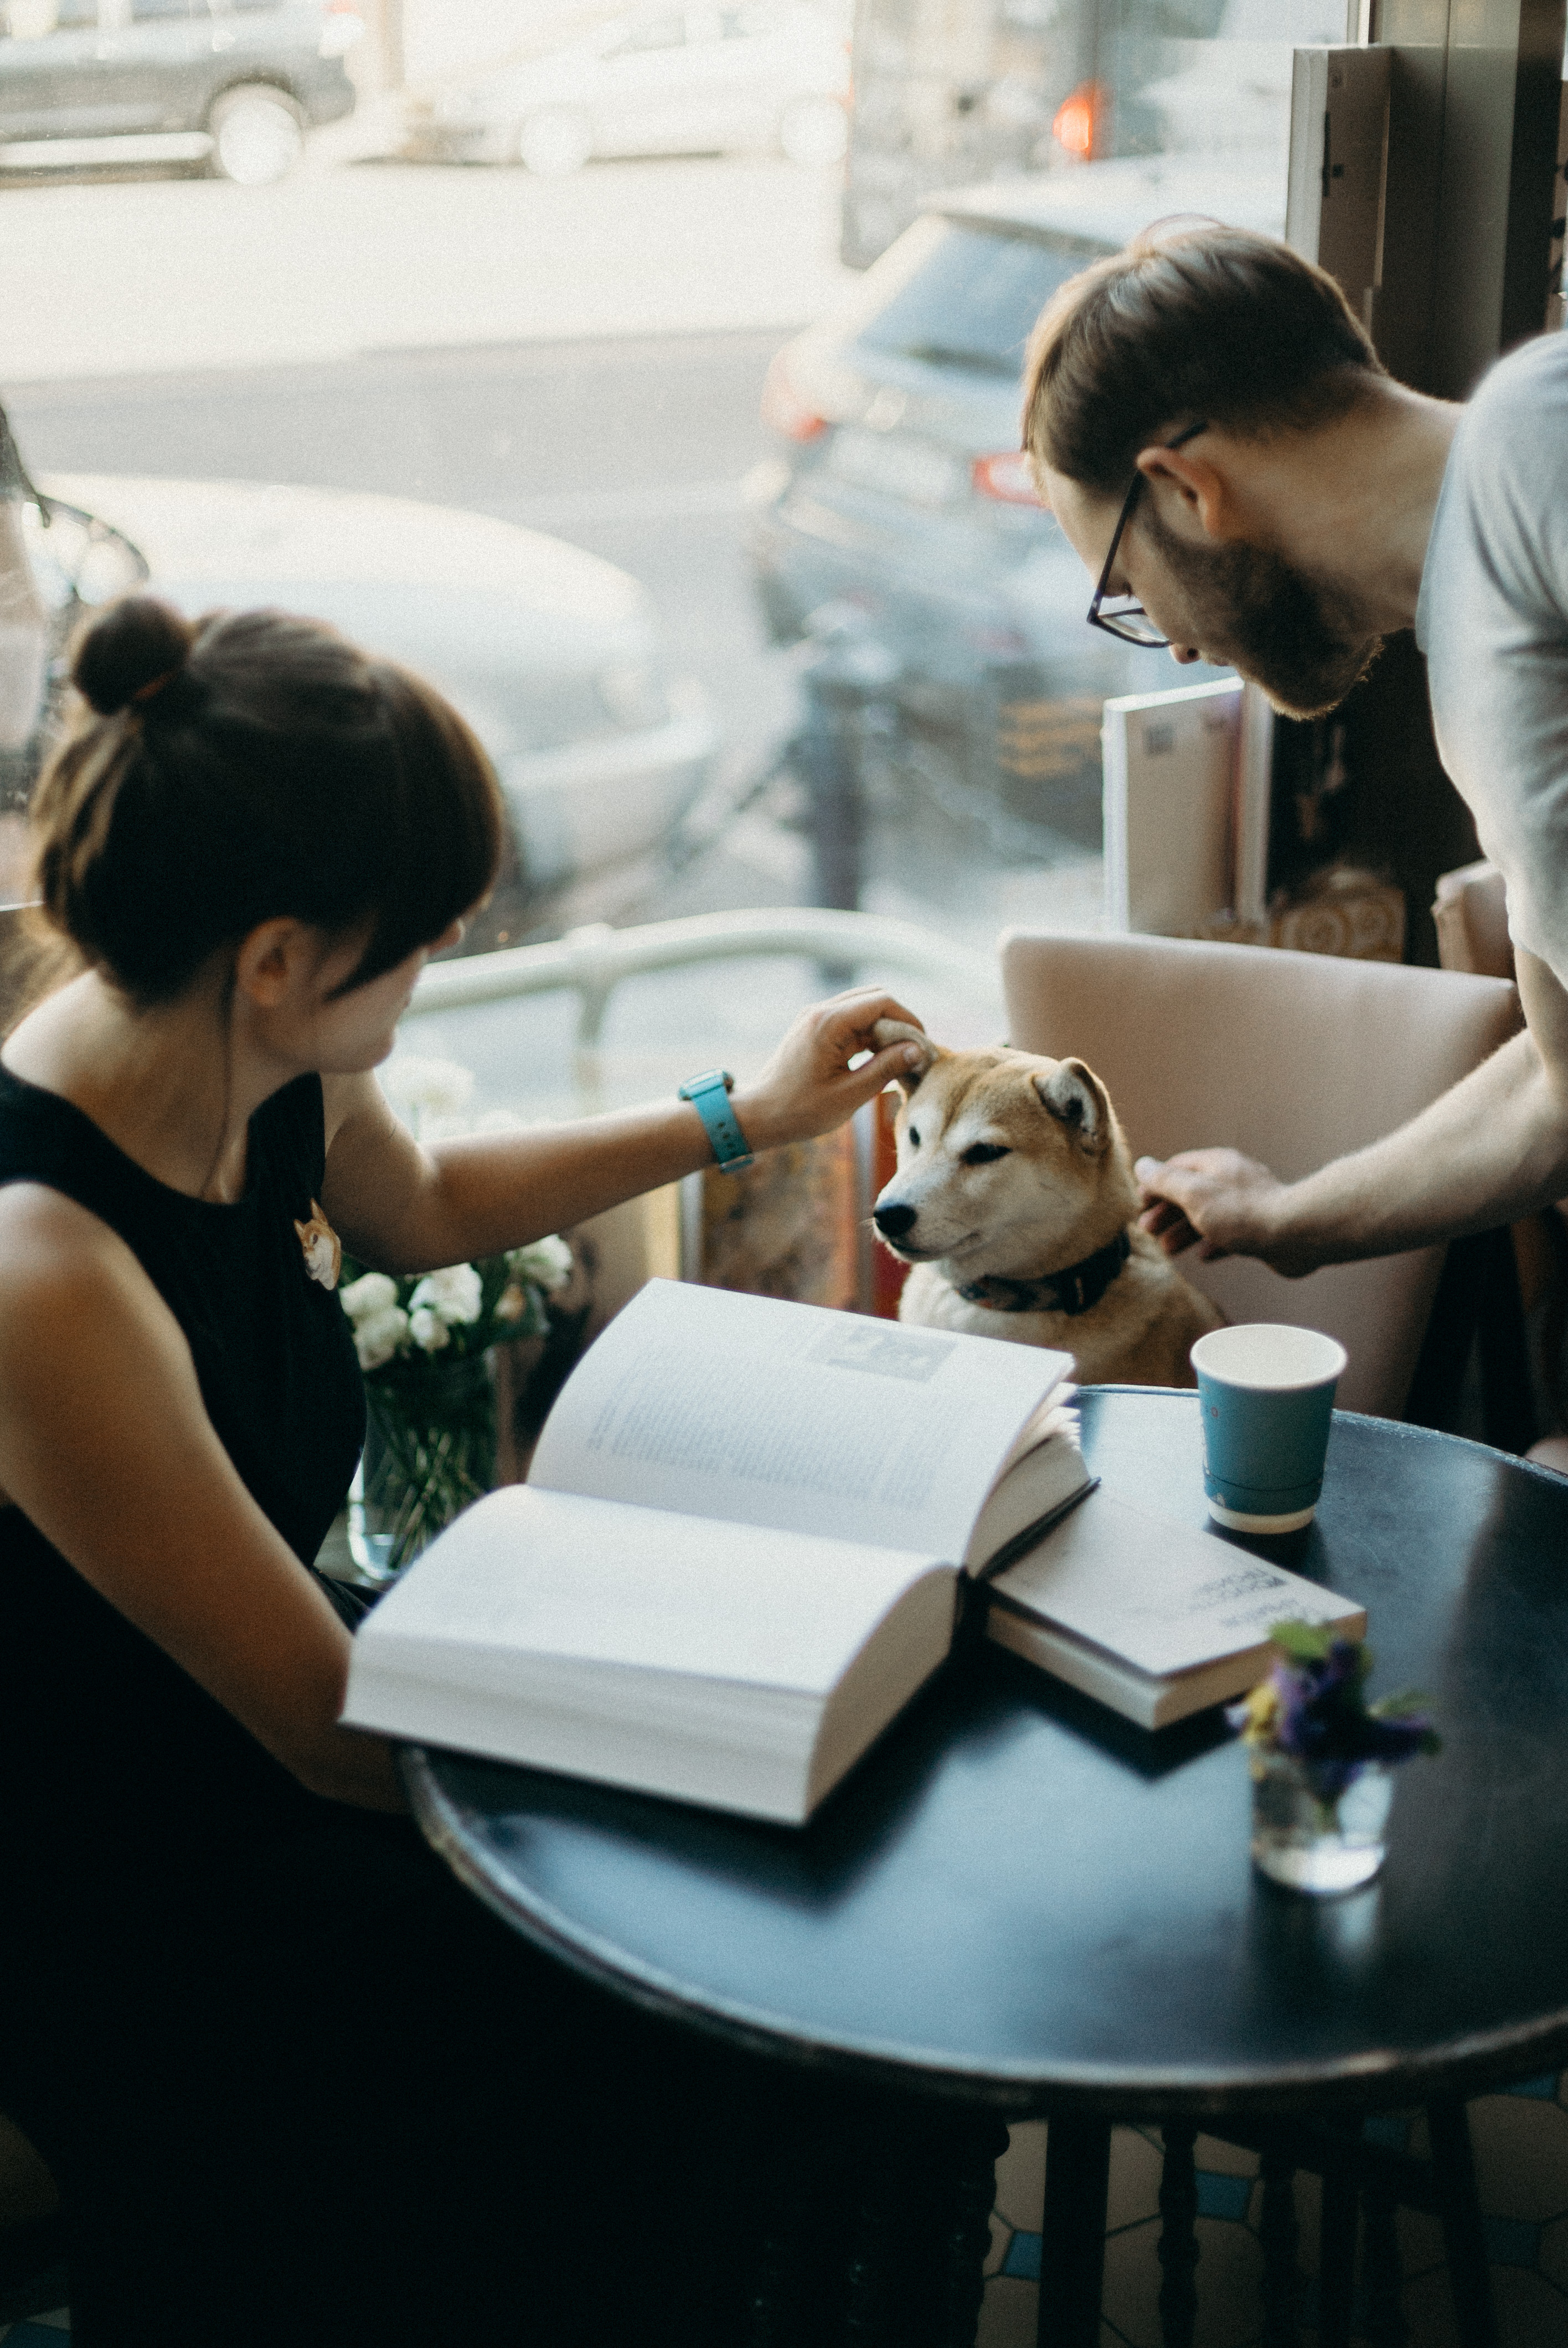 Photo Of People Beside Dog